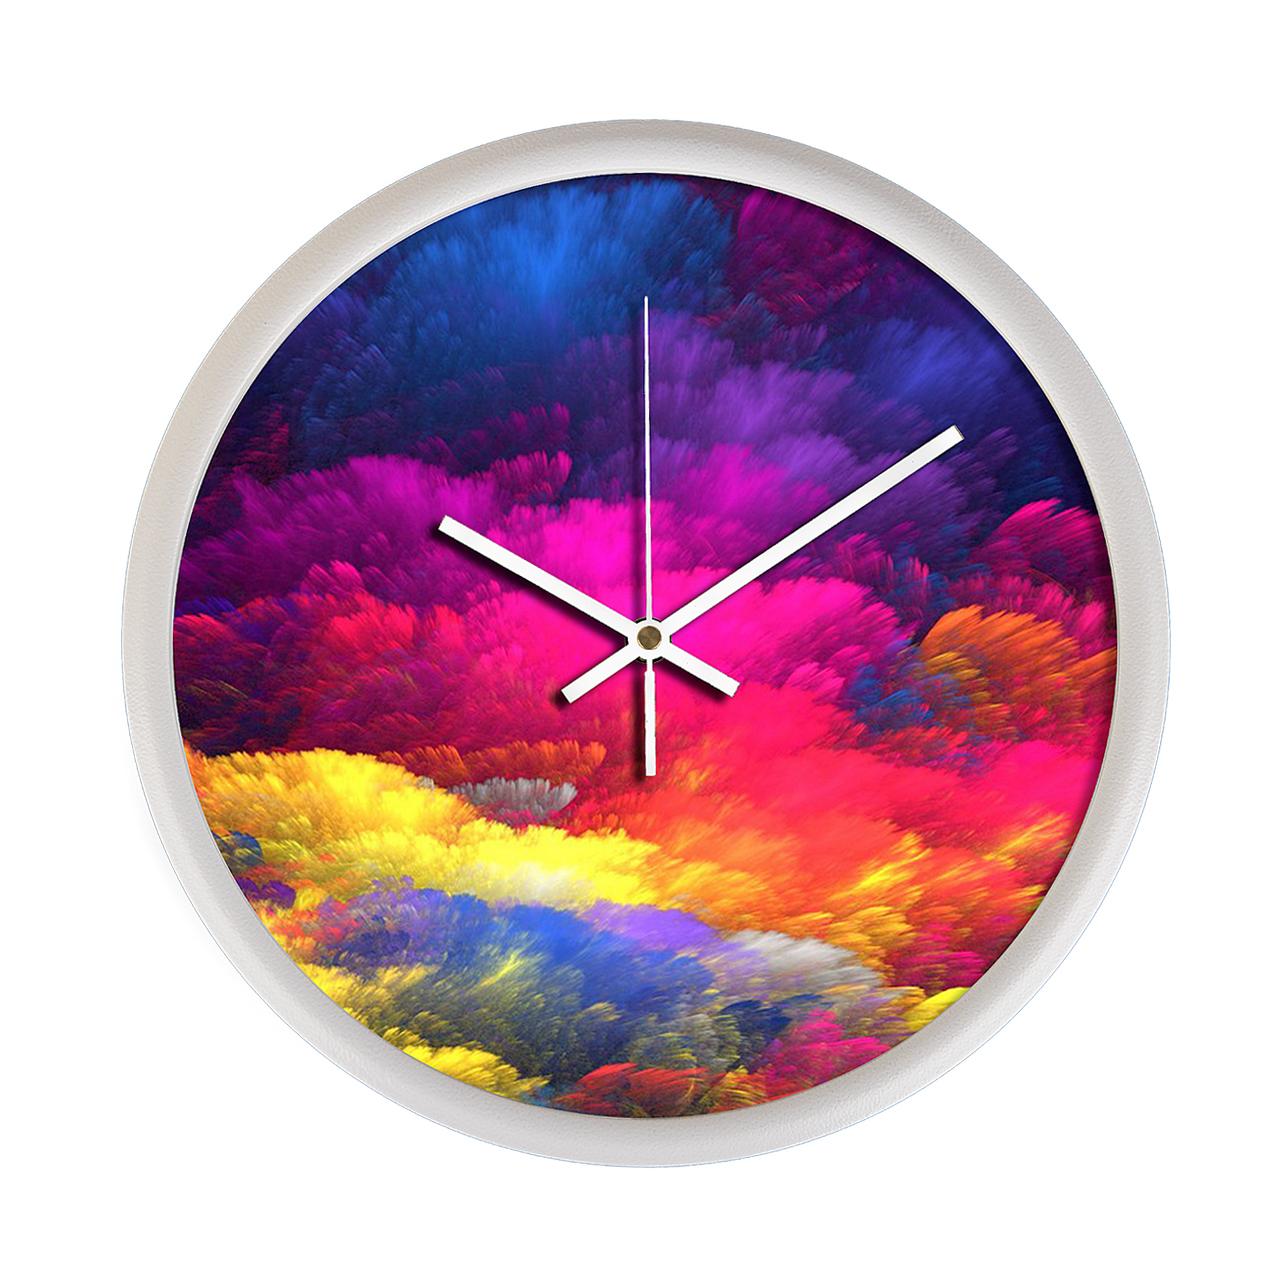 ساعت دیواری مینی مال لاکچری مدل 35Dio3_0138